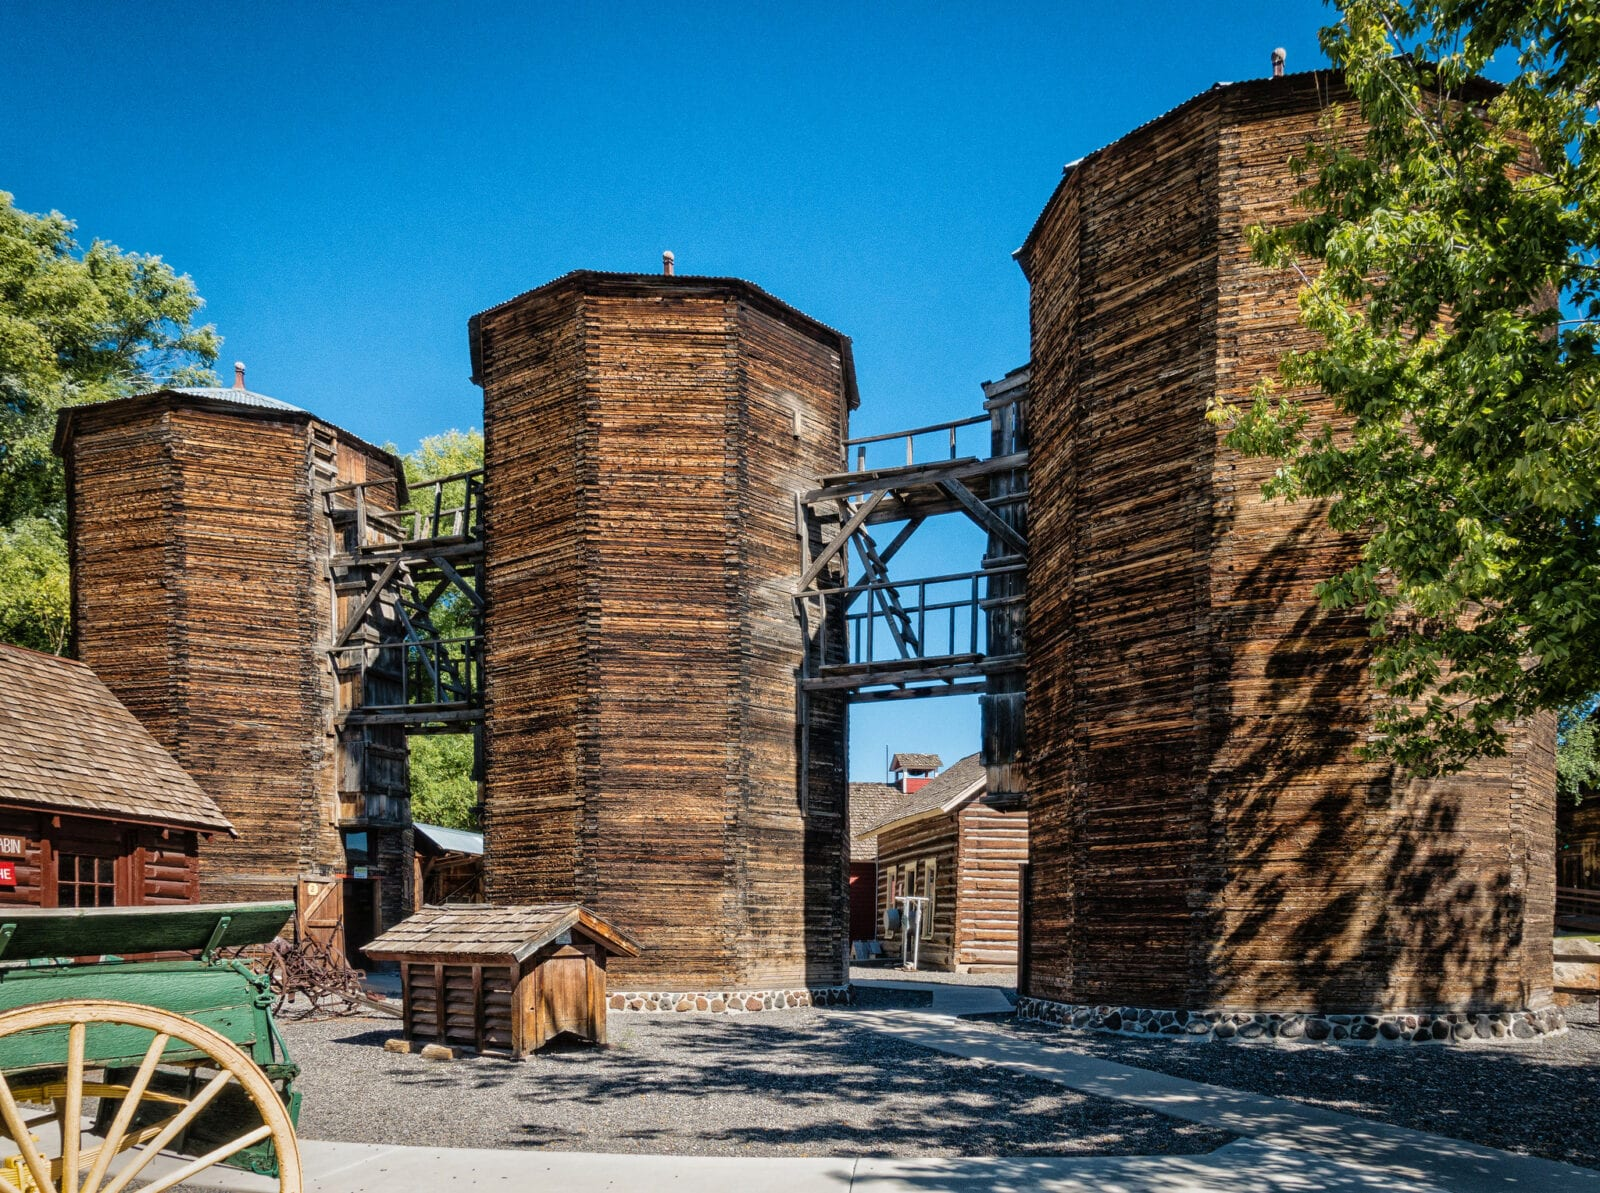 Image of the barn silos at the Pioneer Town Museum in Cedaredge, Colorado